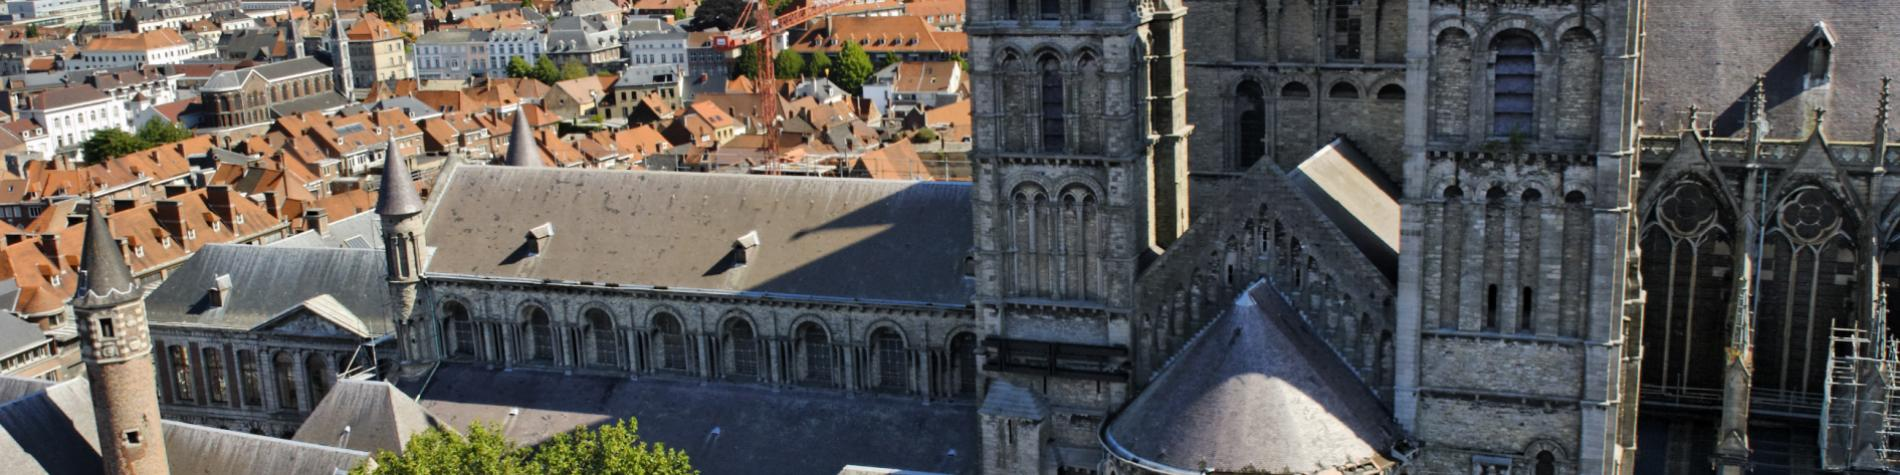 Tournai - Cathédrale Notre-Dame - patrimoine mondial - UNESCO